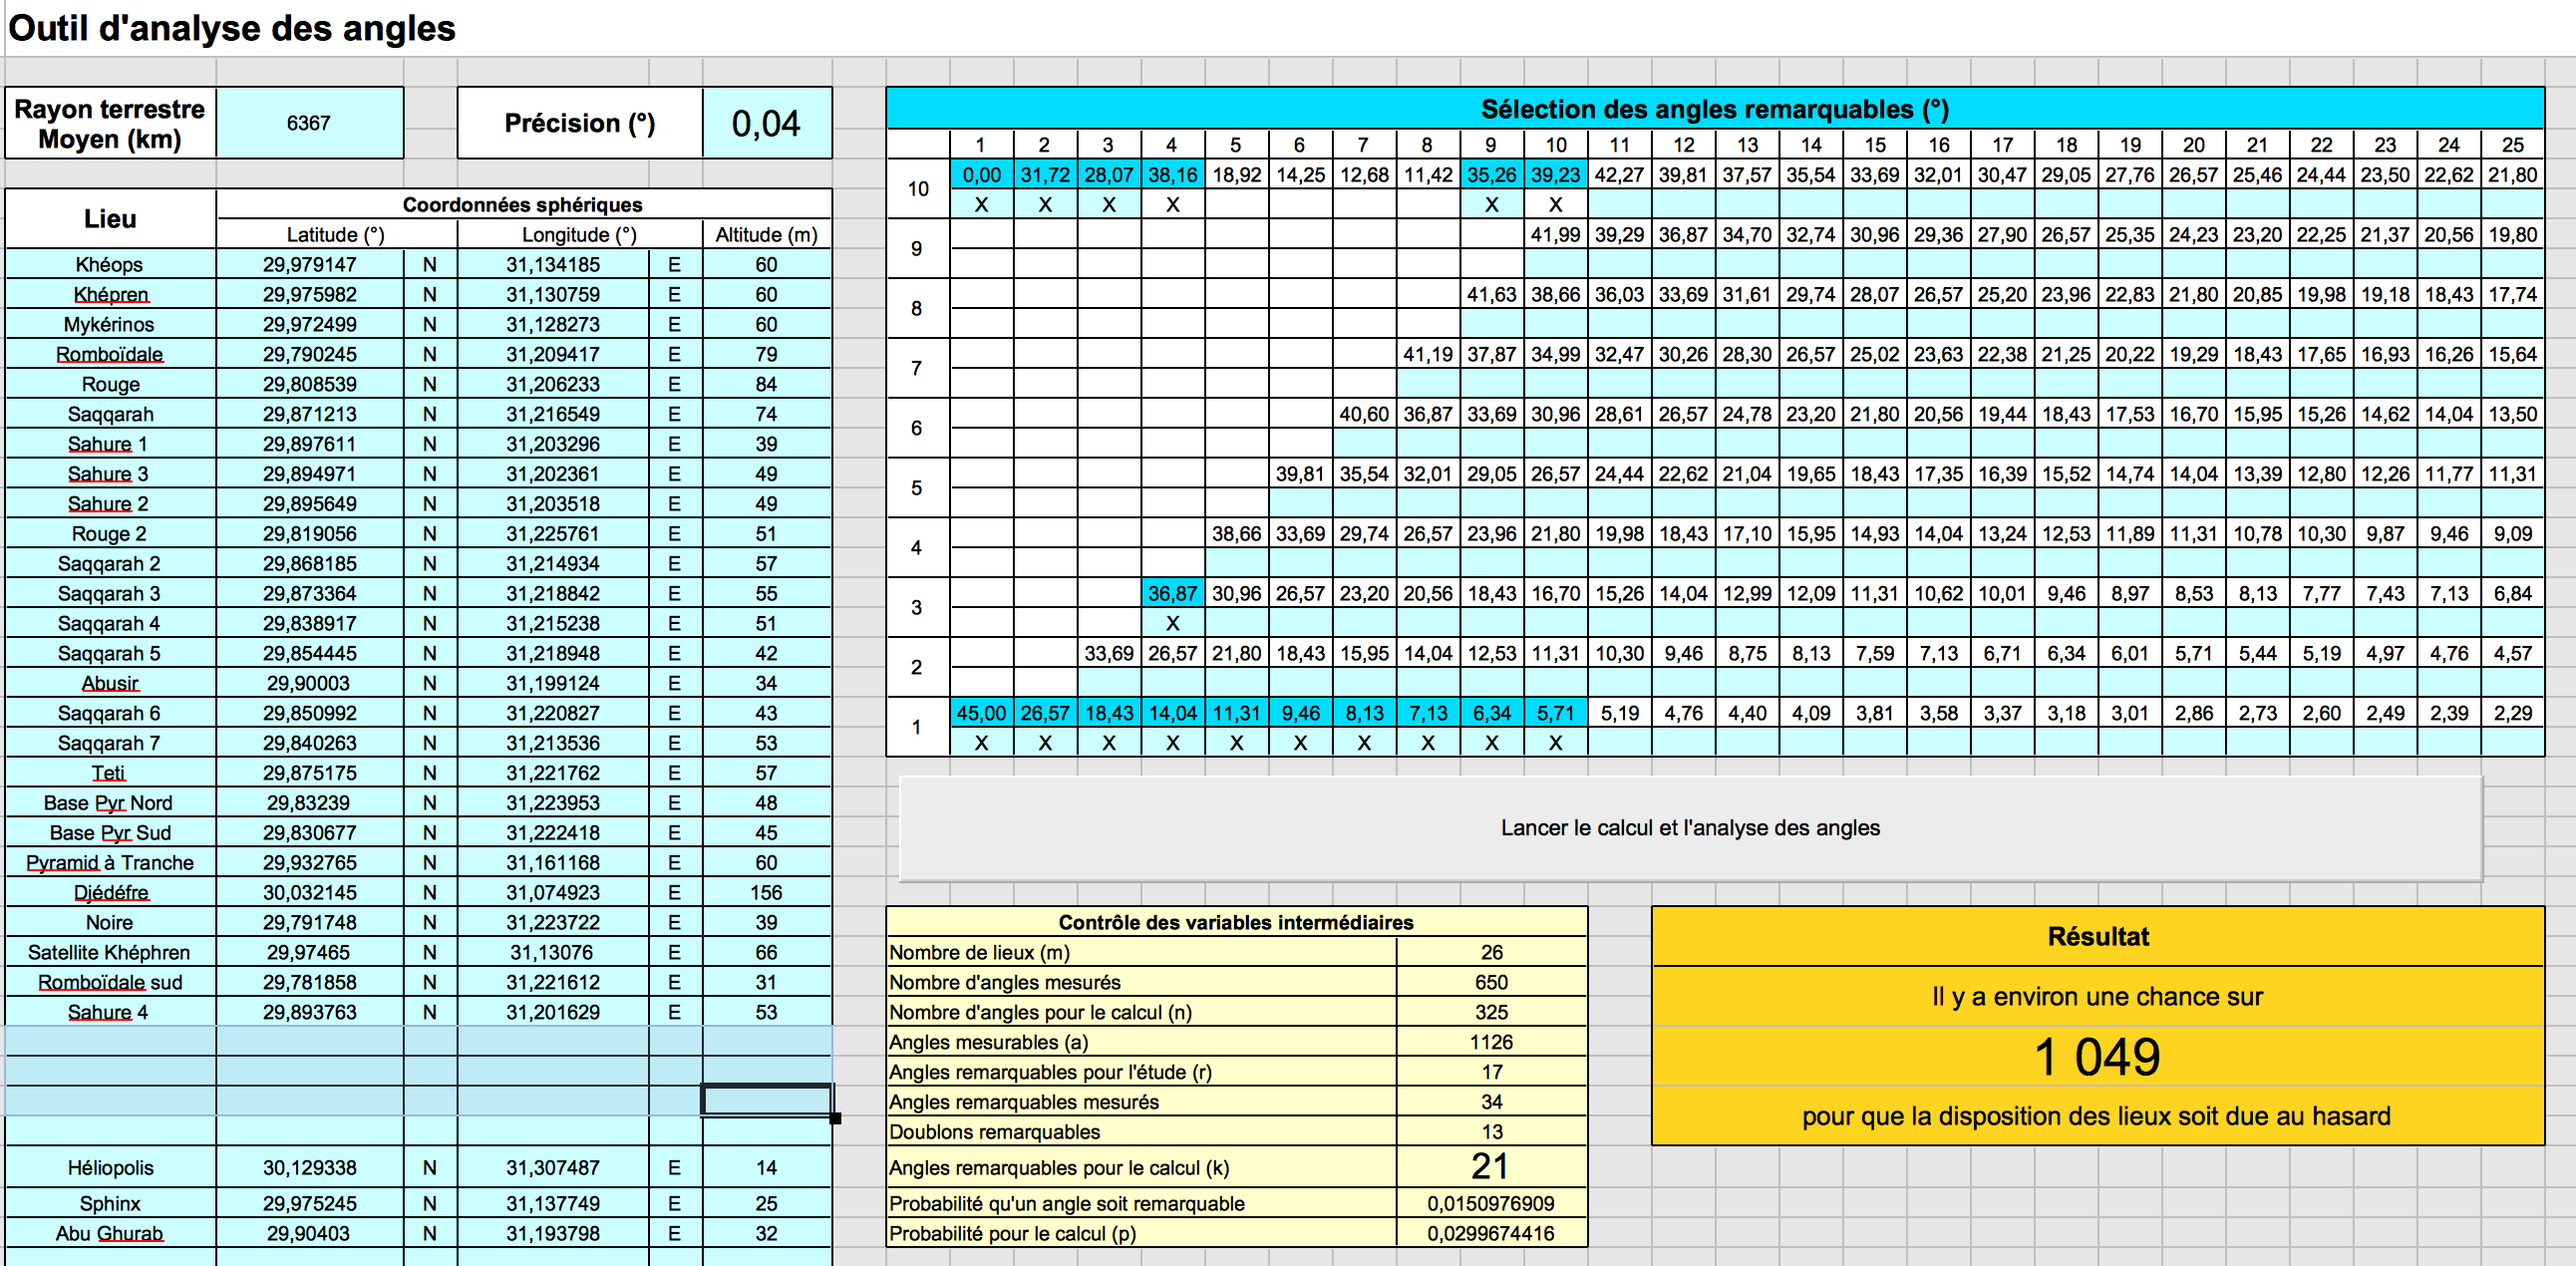 2017-11-15 23:58:29